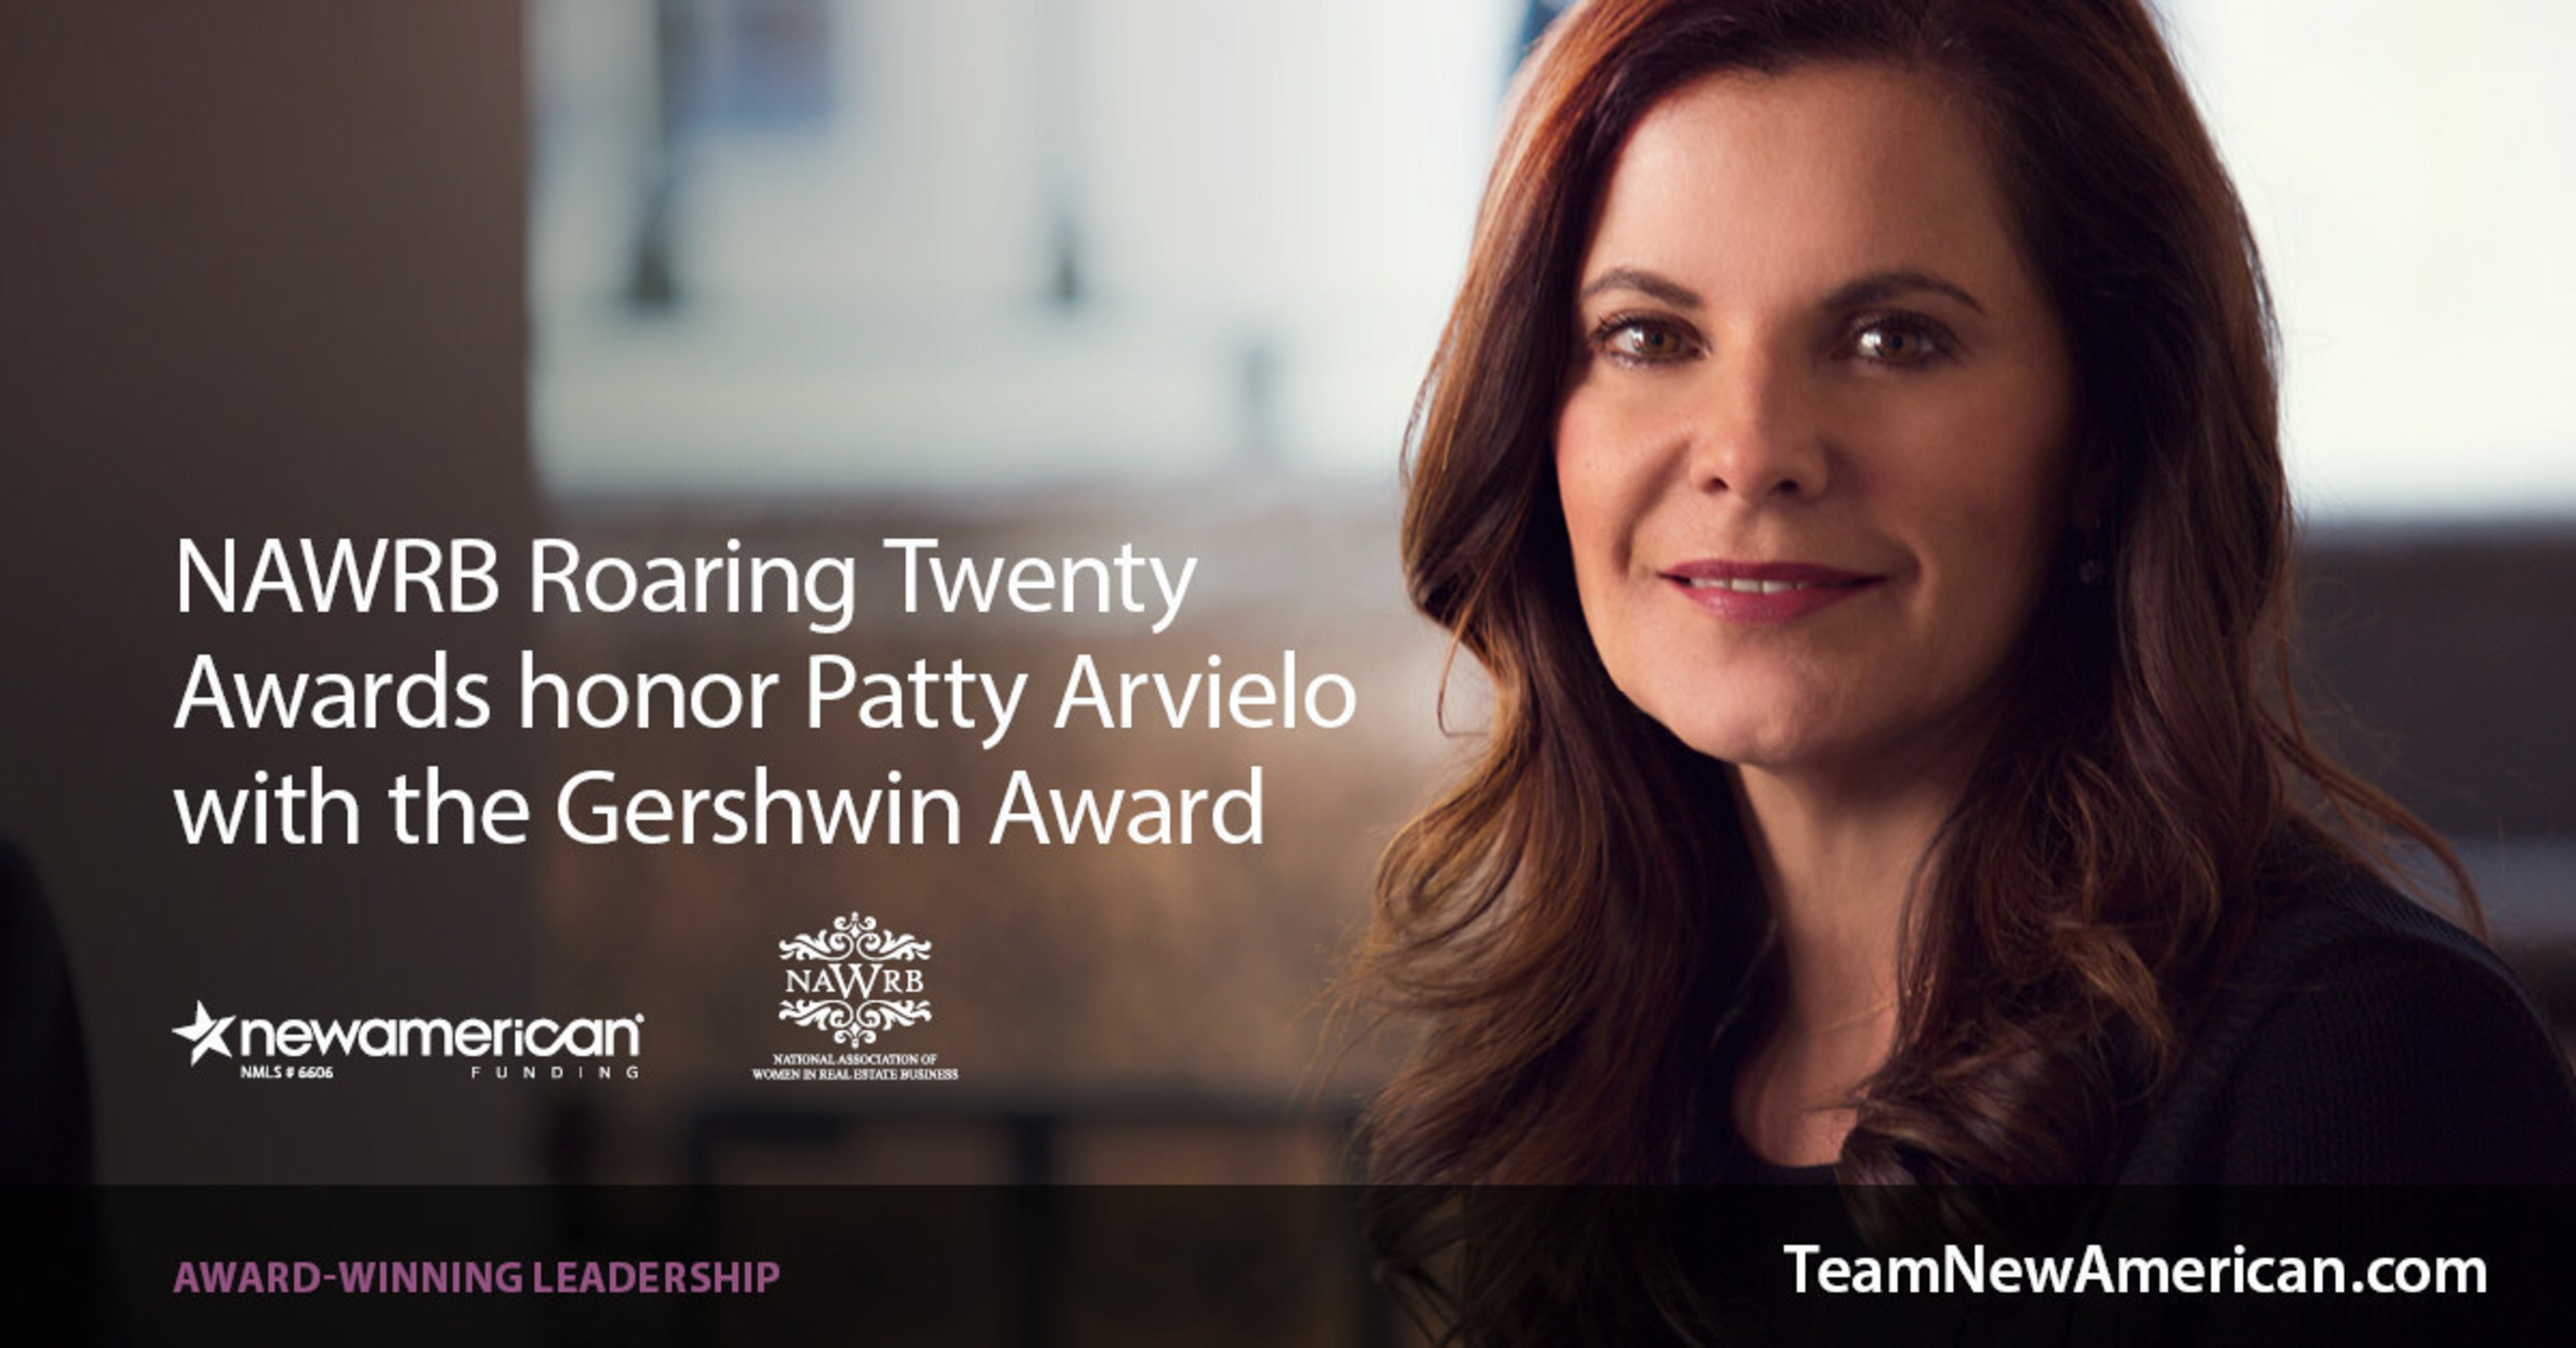 NAWRB Roaring Twenty Awards honor Patty Arvielo with the Gershwin Award.